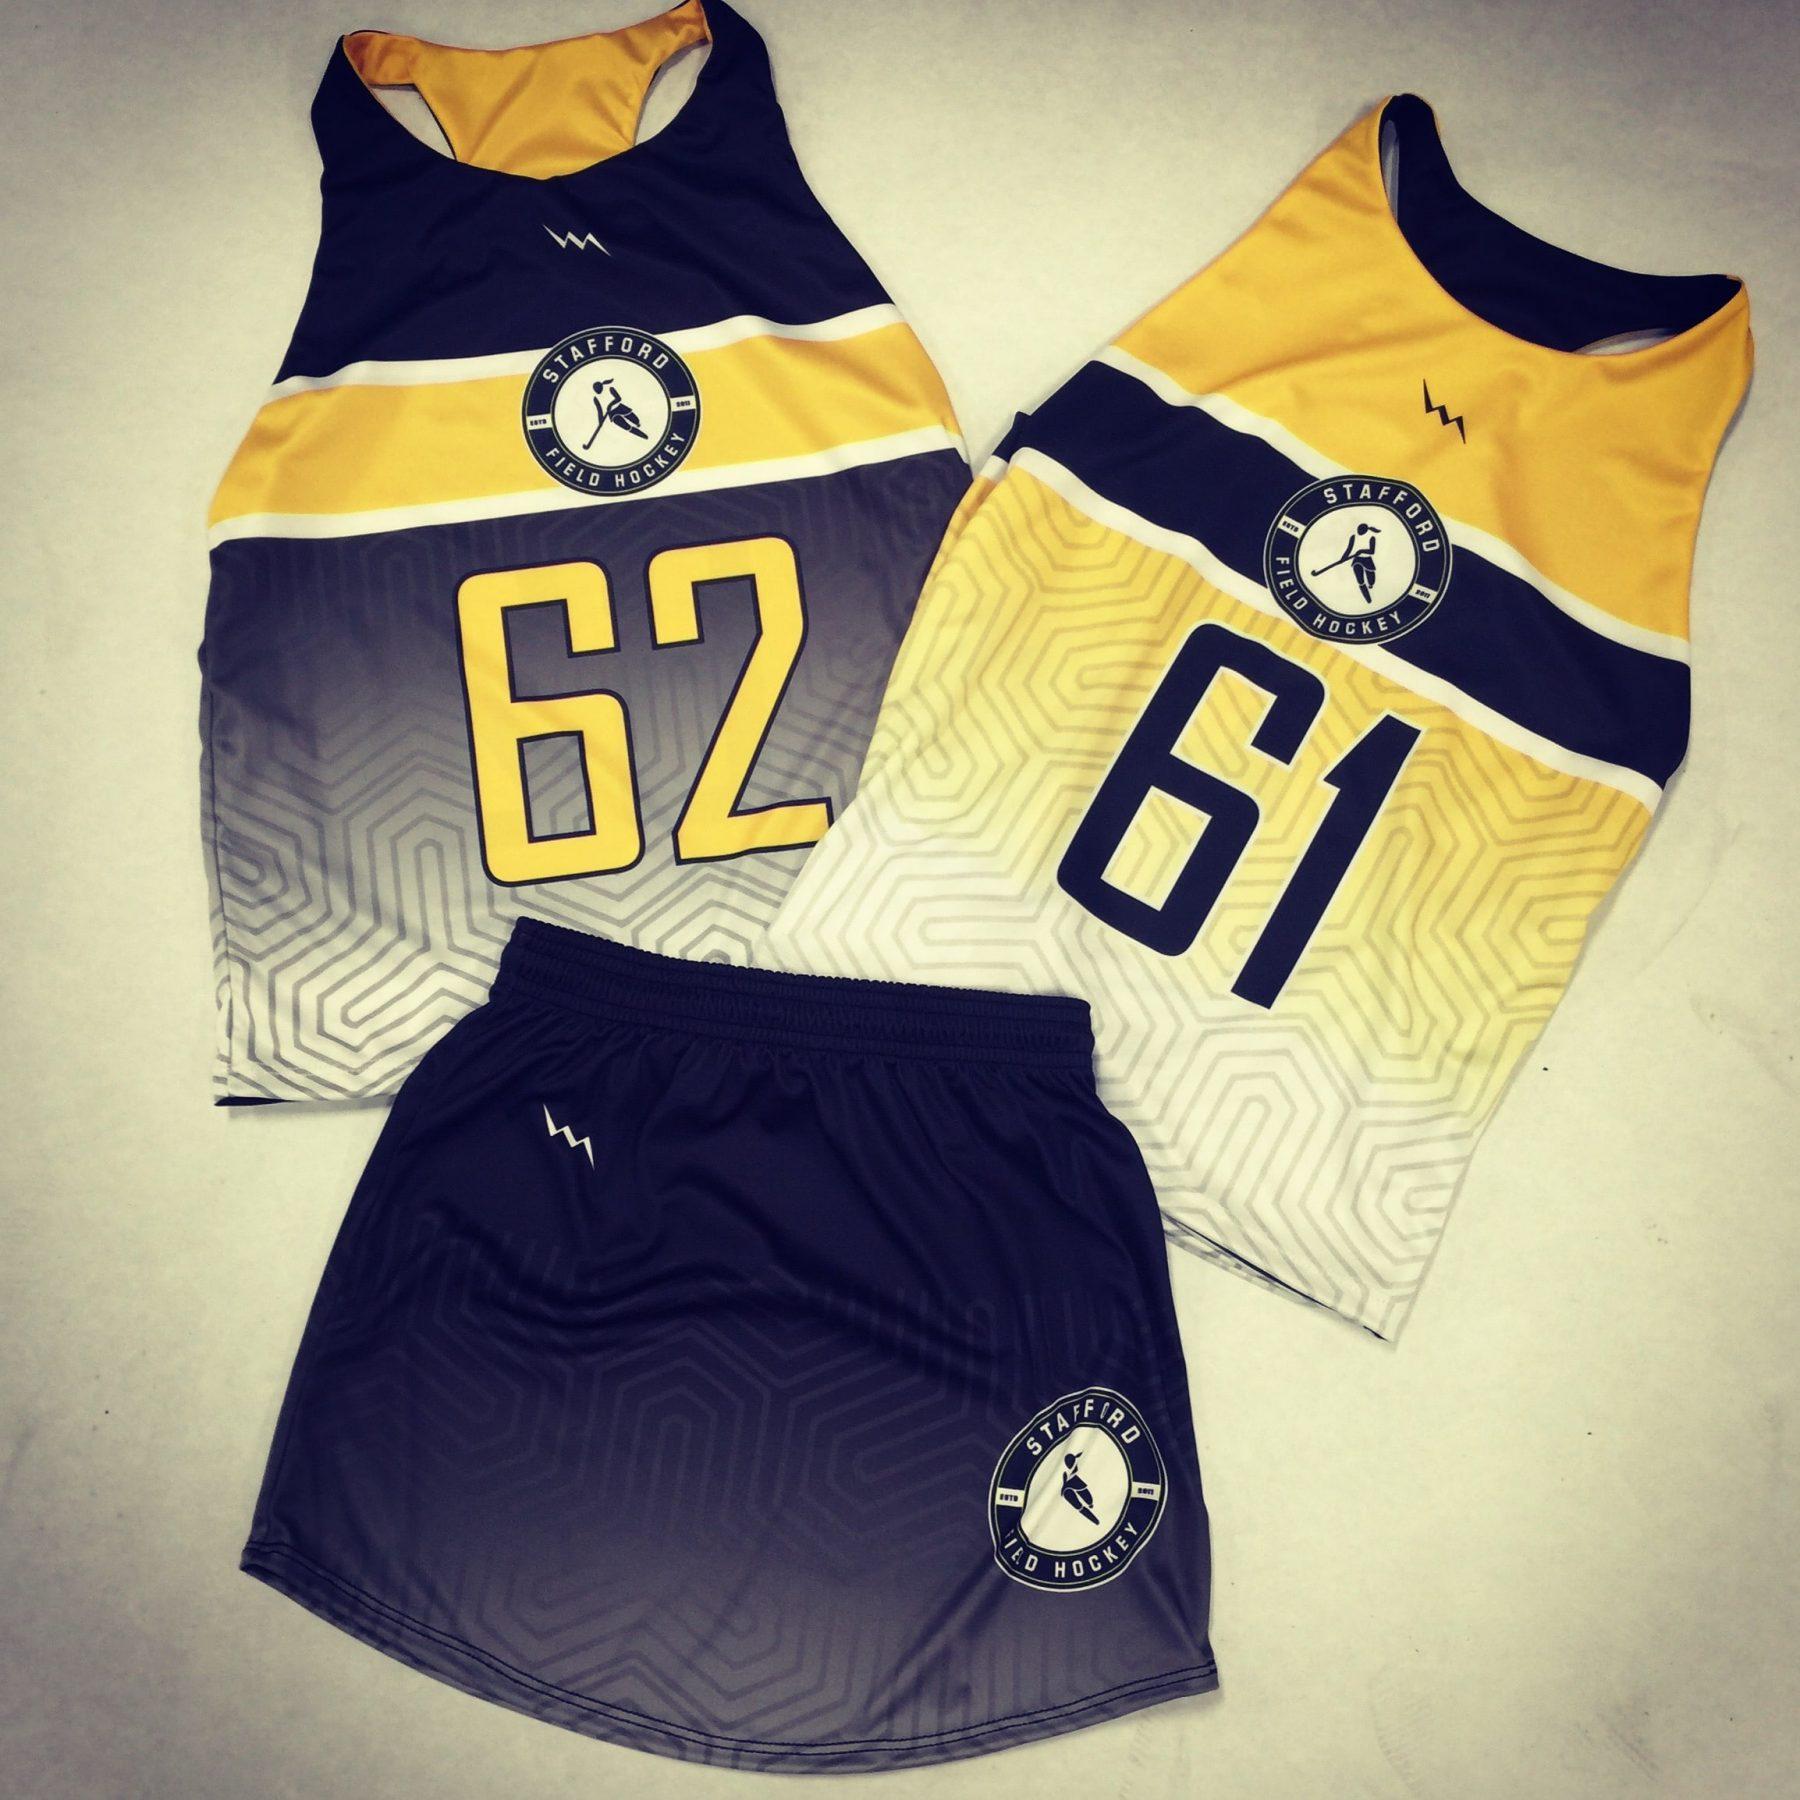 ladies field hockey uniforms